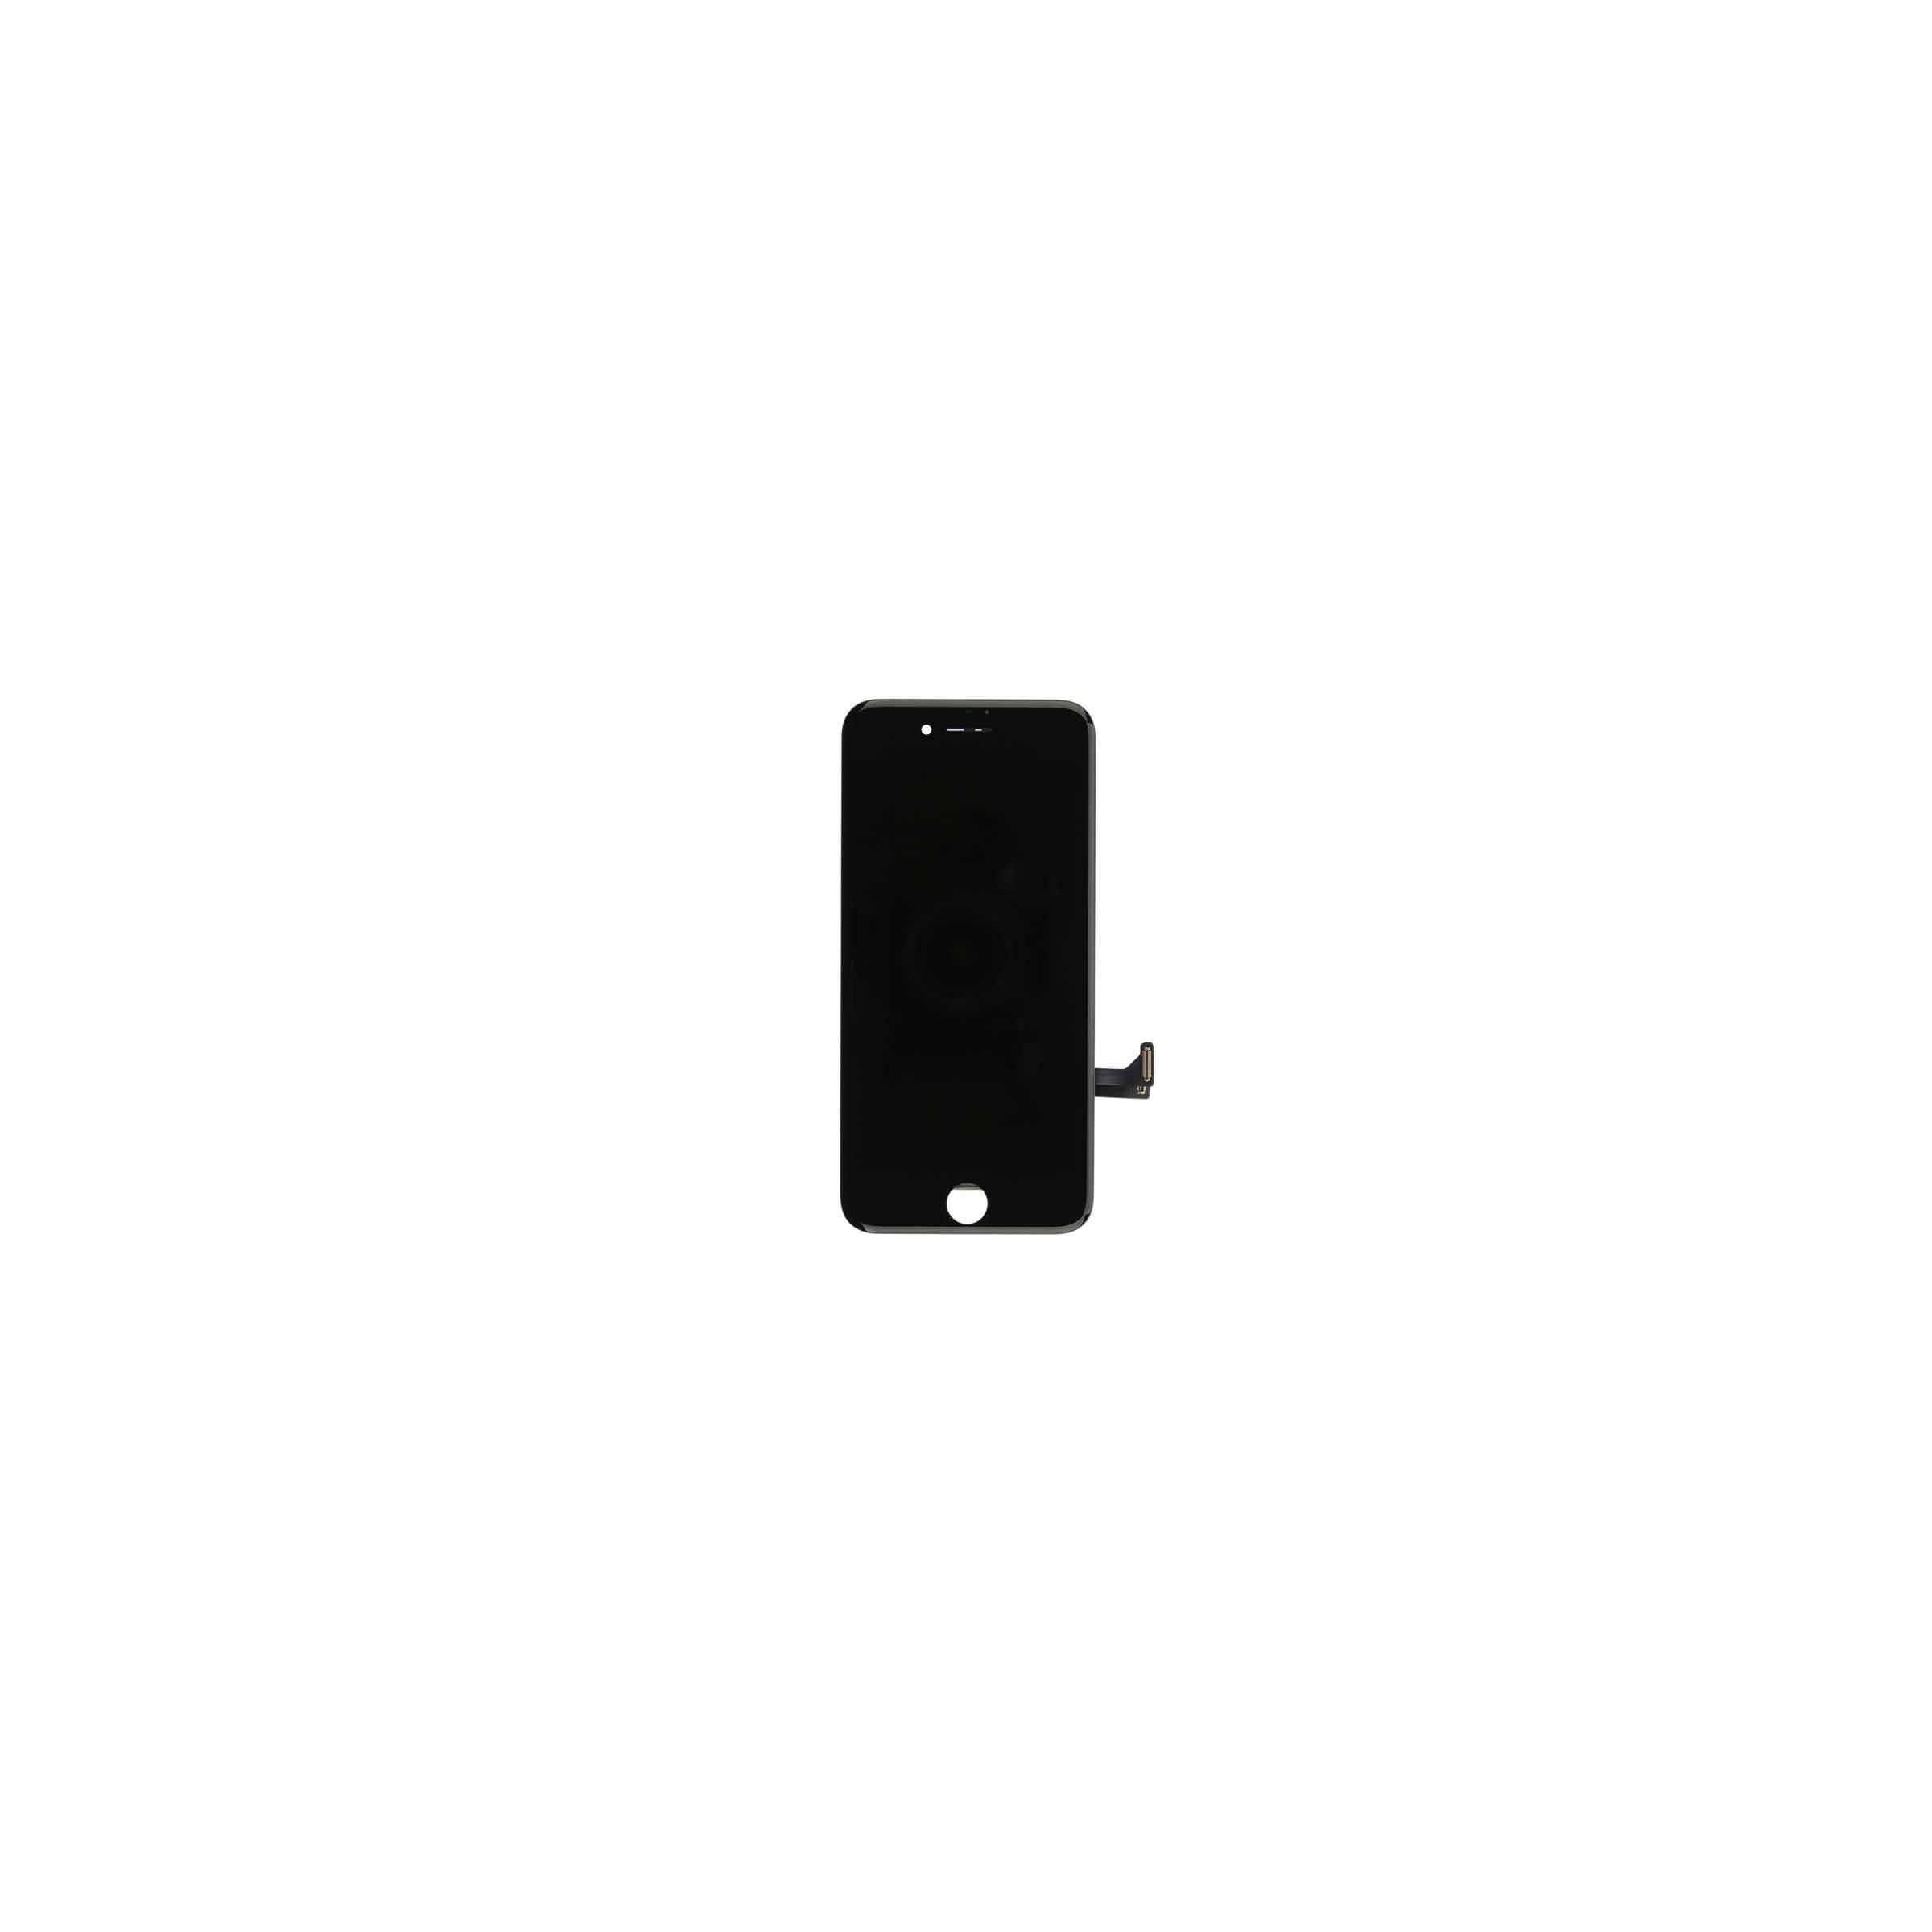 sinox – Iphone 8 plus skærm i semi original kvalitet farve sort fra mackabler.dk